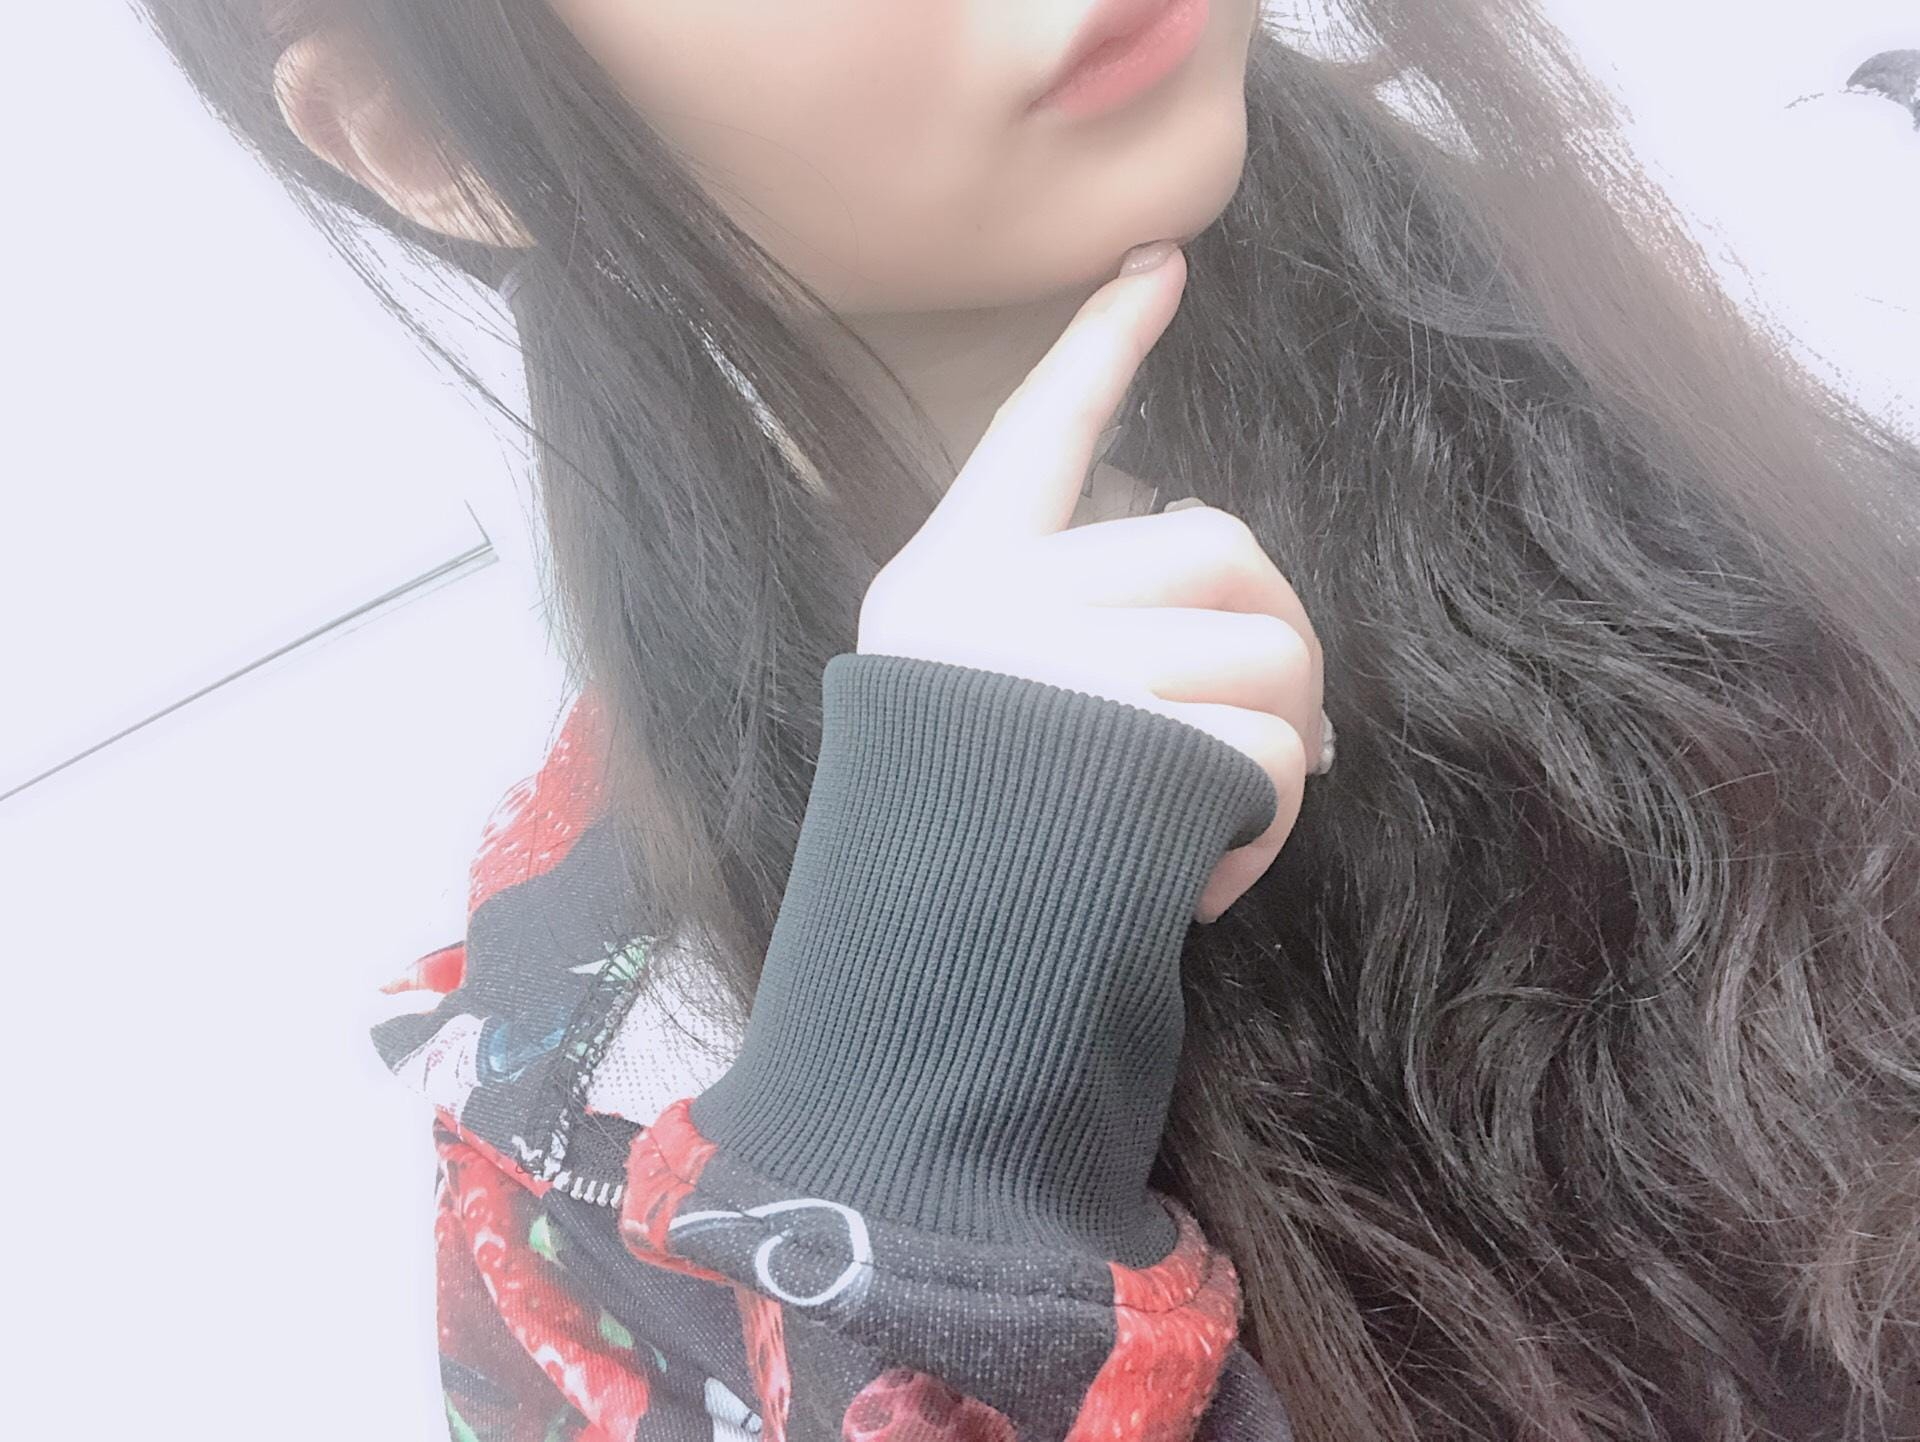 「Re: 雨☔」10/15(月) 19:55 | さなの写メ・風俗動画